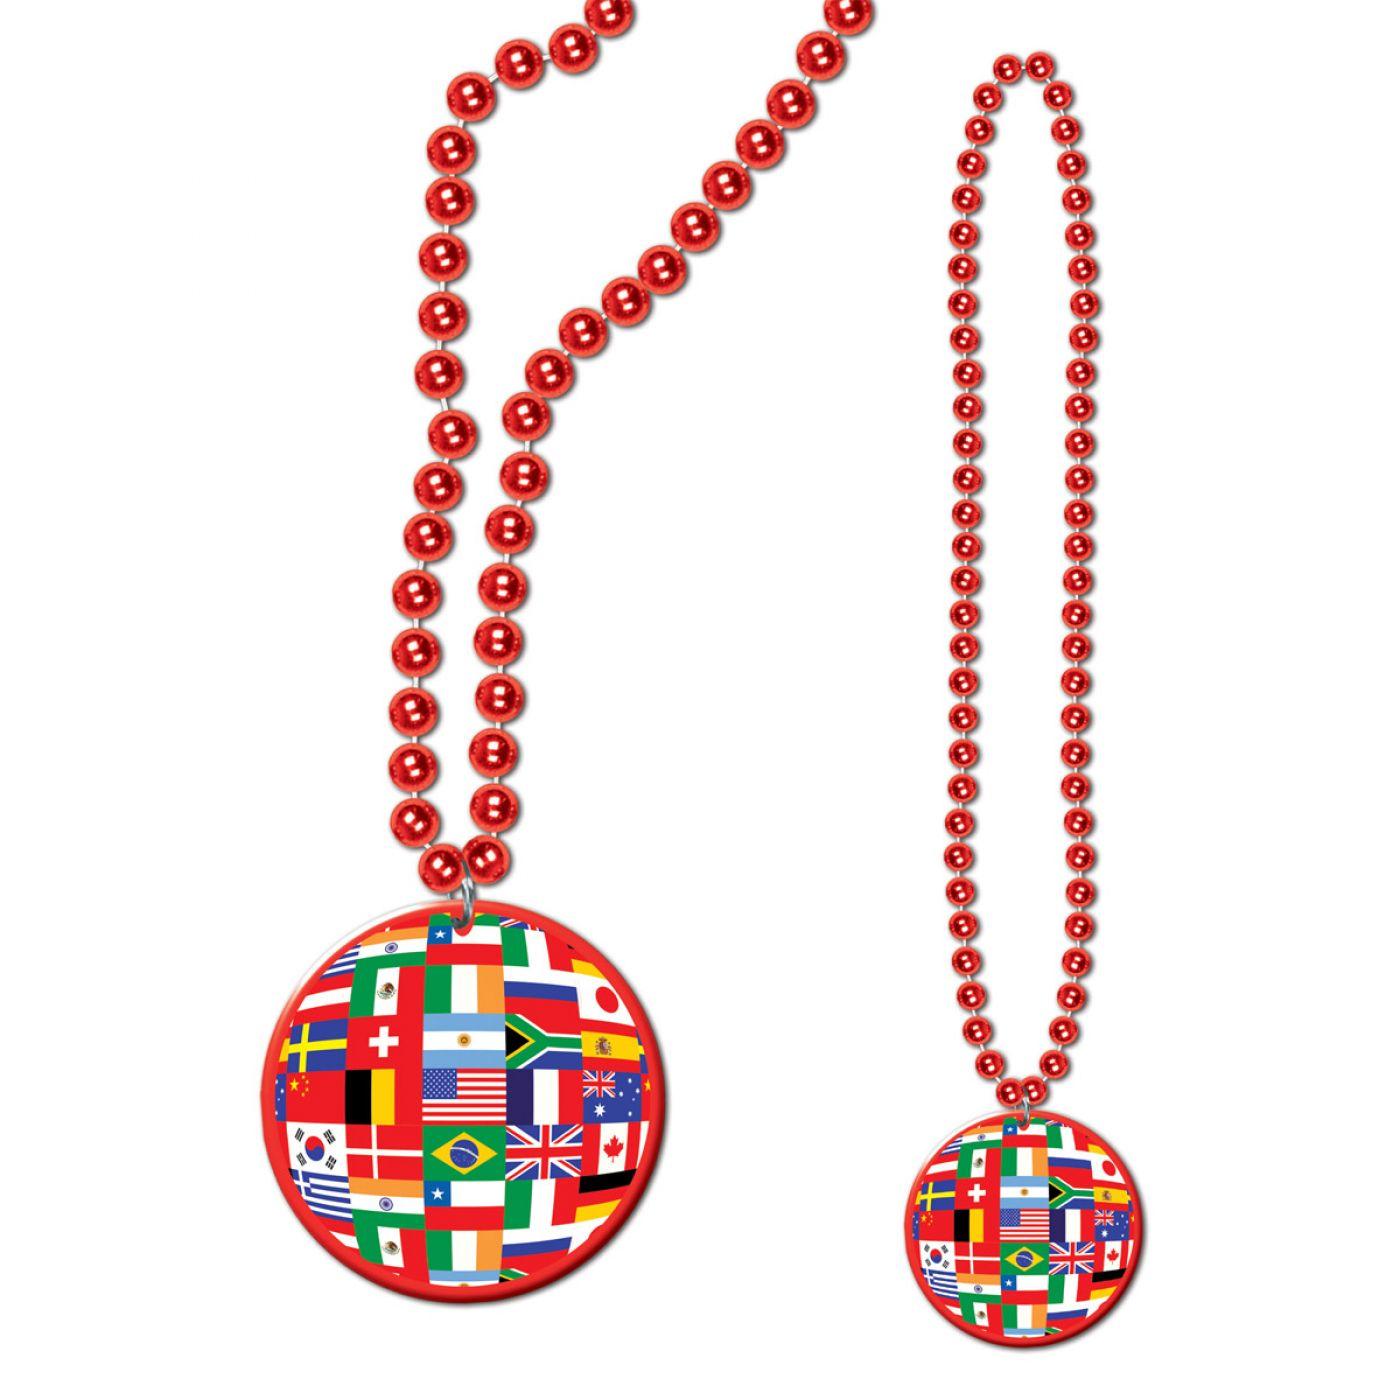 Image of Beads w/International Flag Medallion